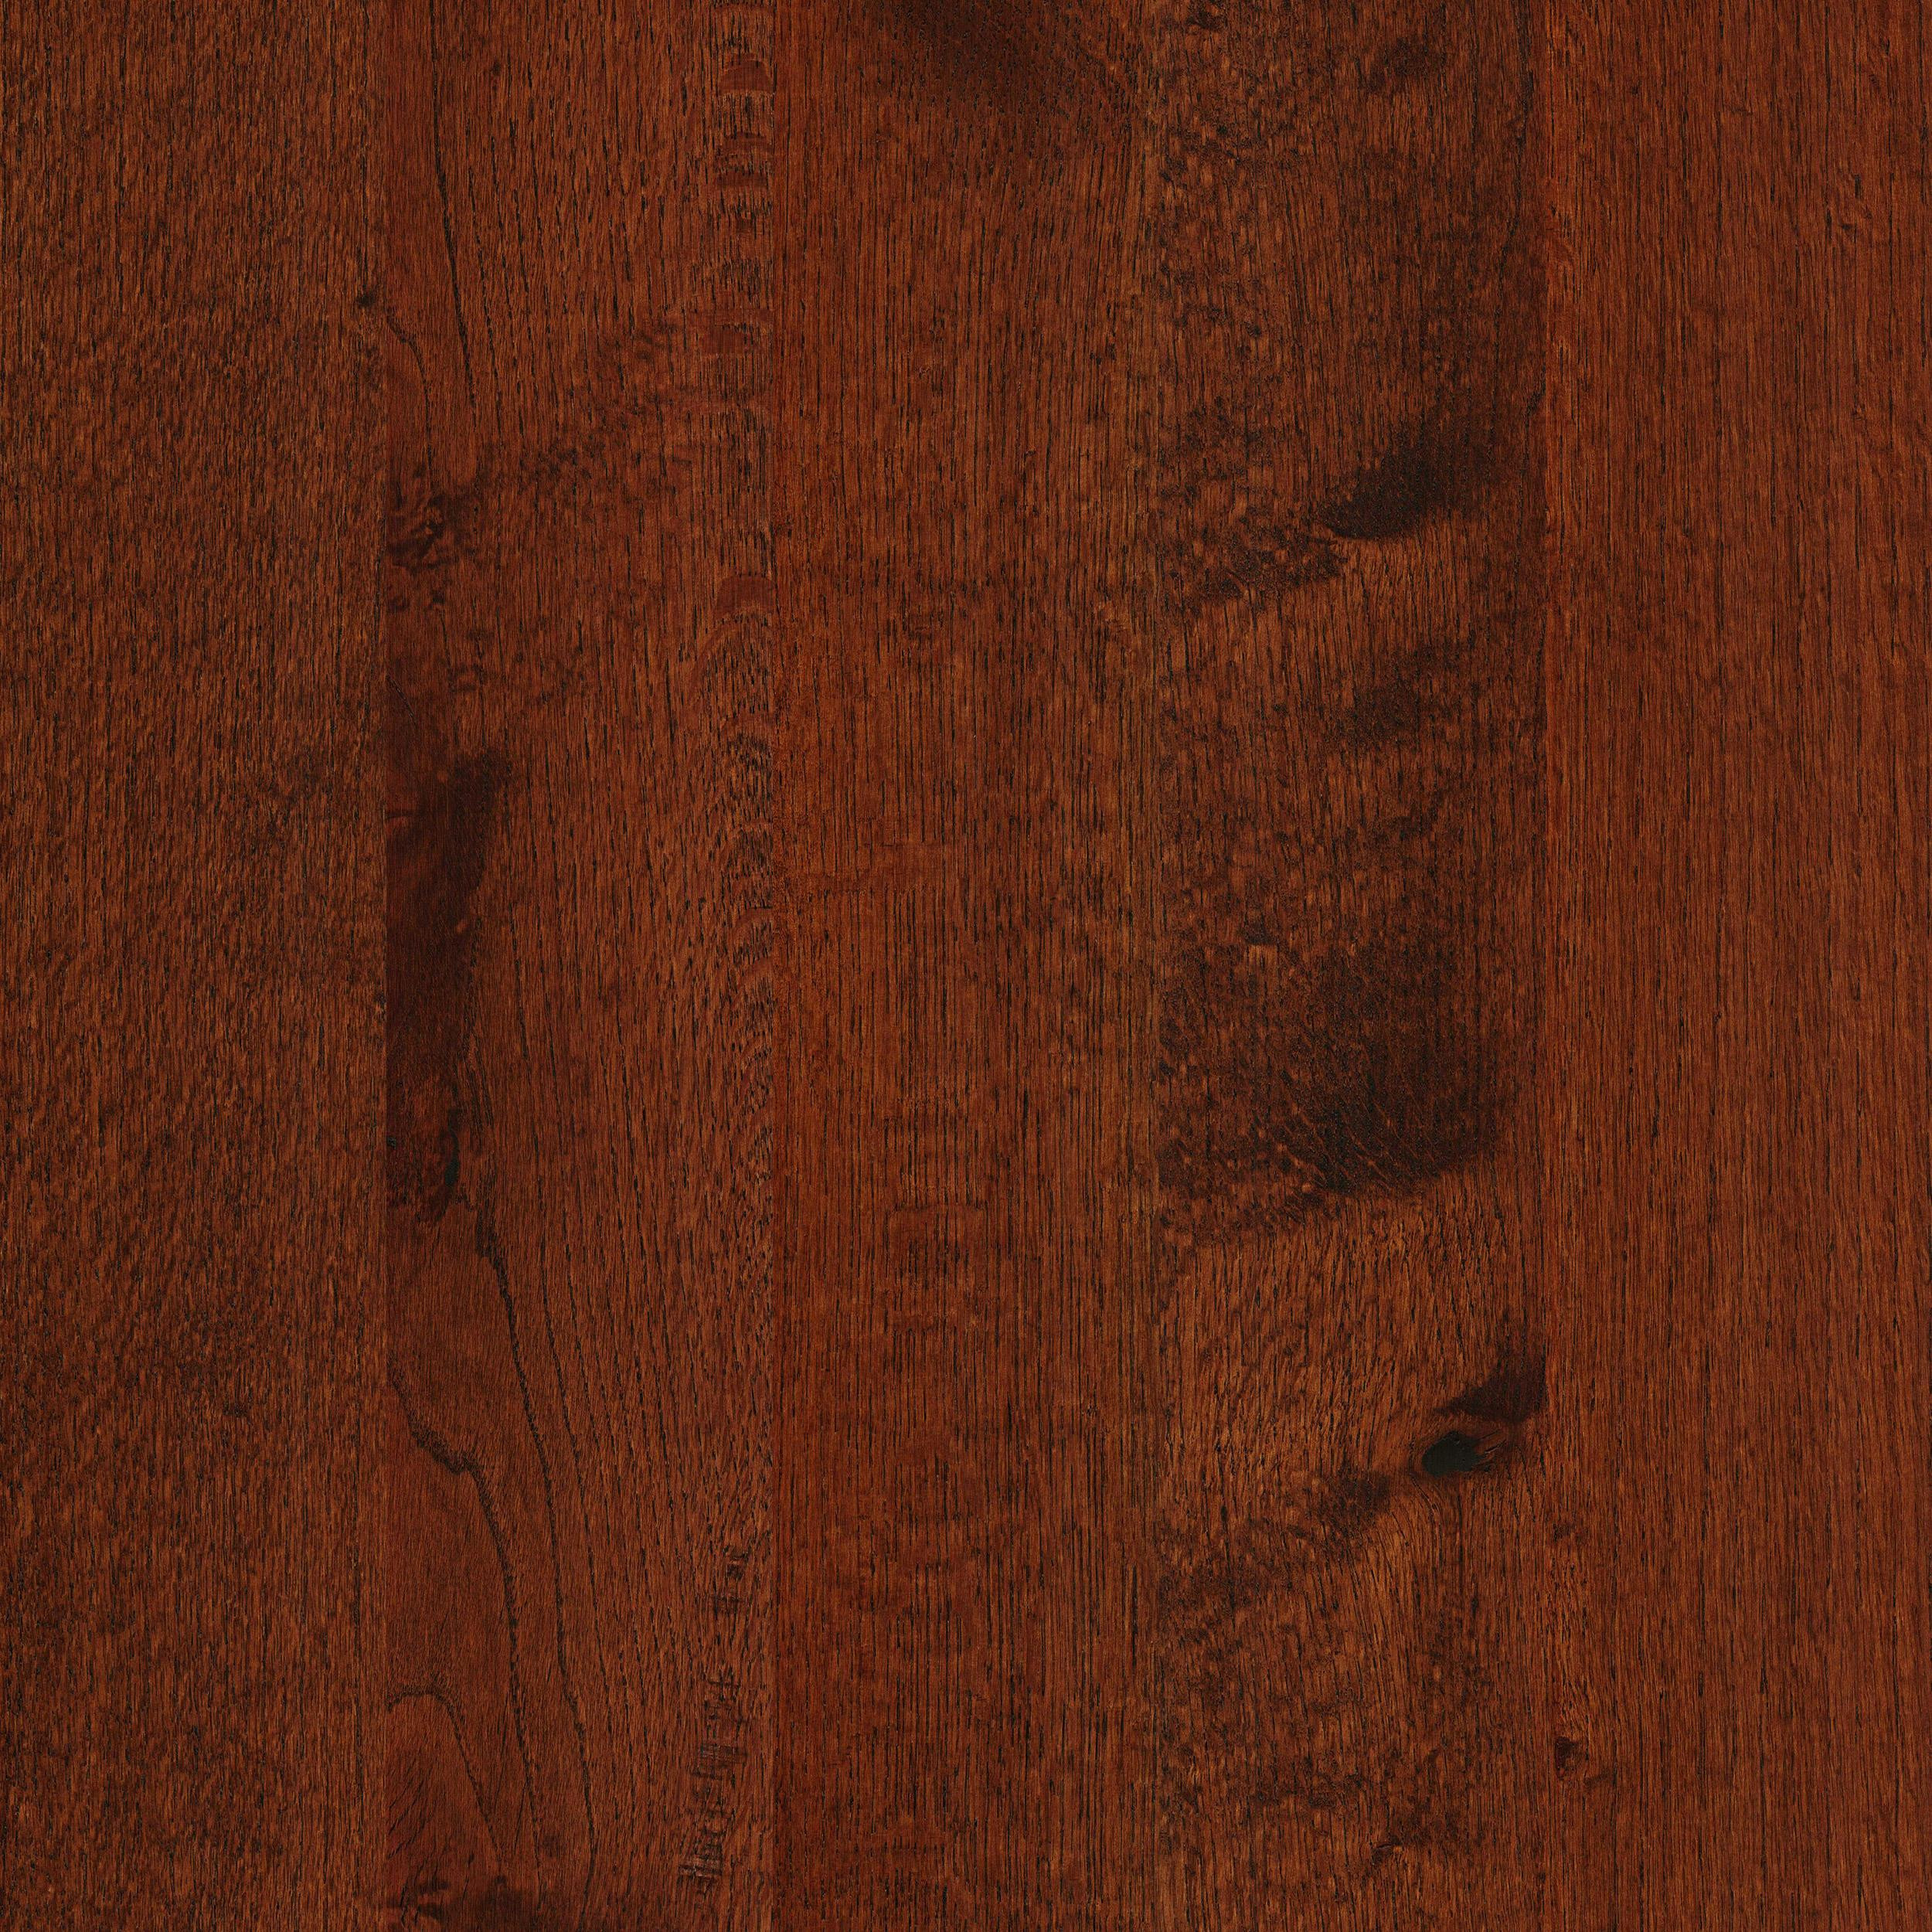 hardwood floor grey oak of timber hardwood red oak sorrell 5 wide solid hardwood flooring within red oak sorrell timber solid approved bk